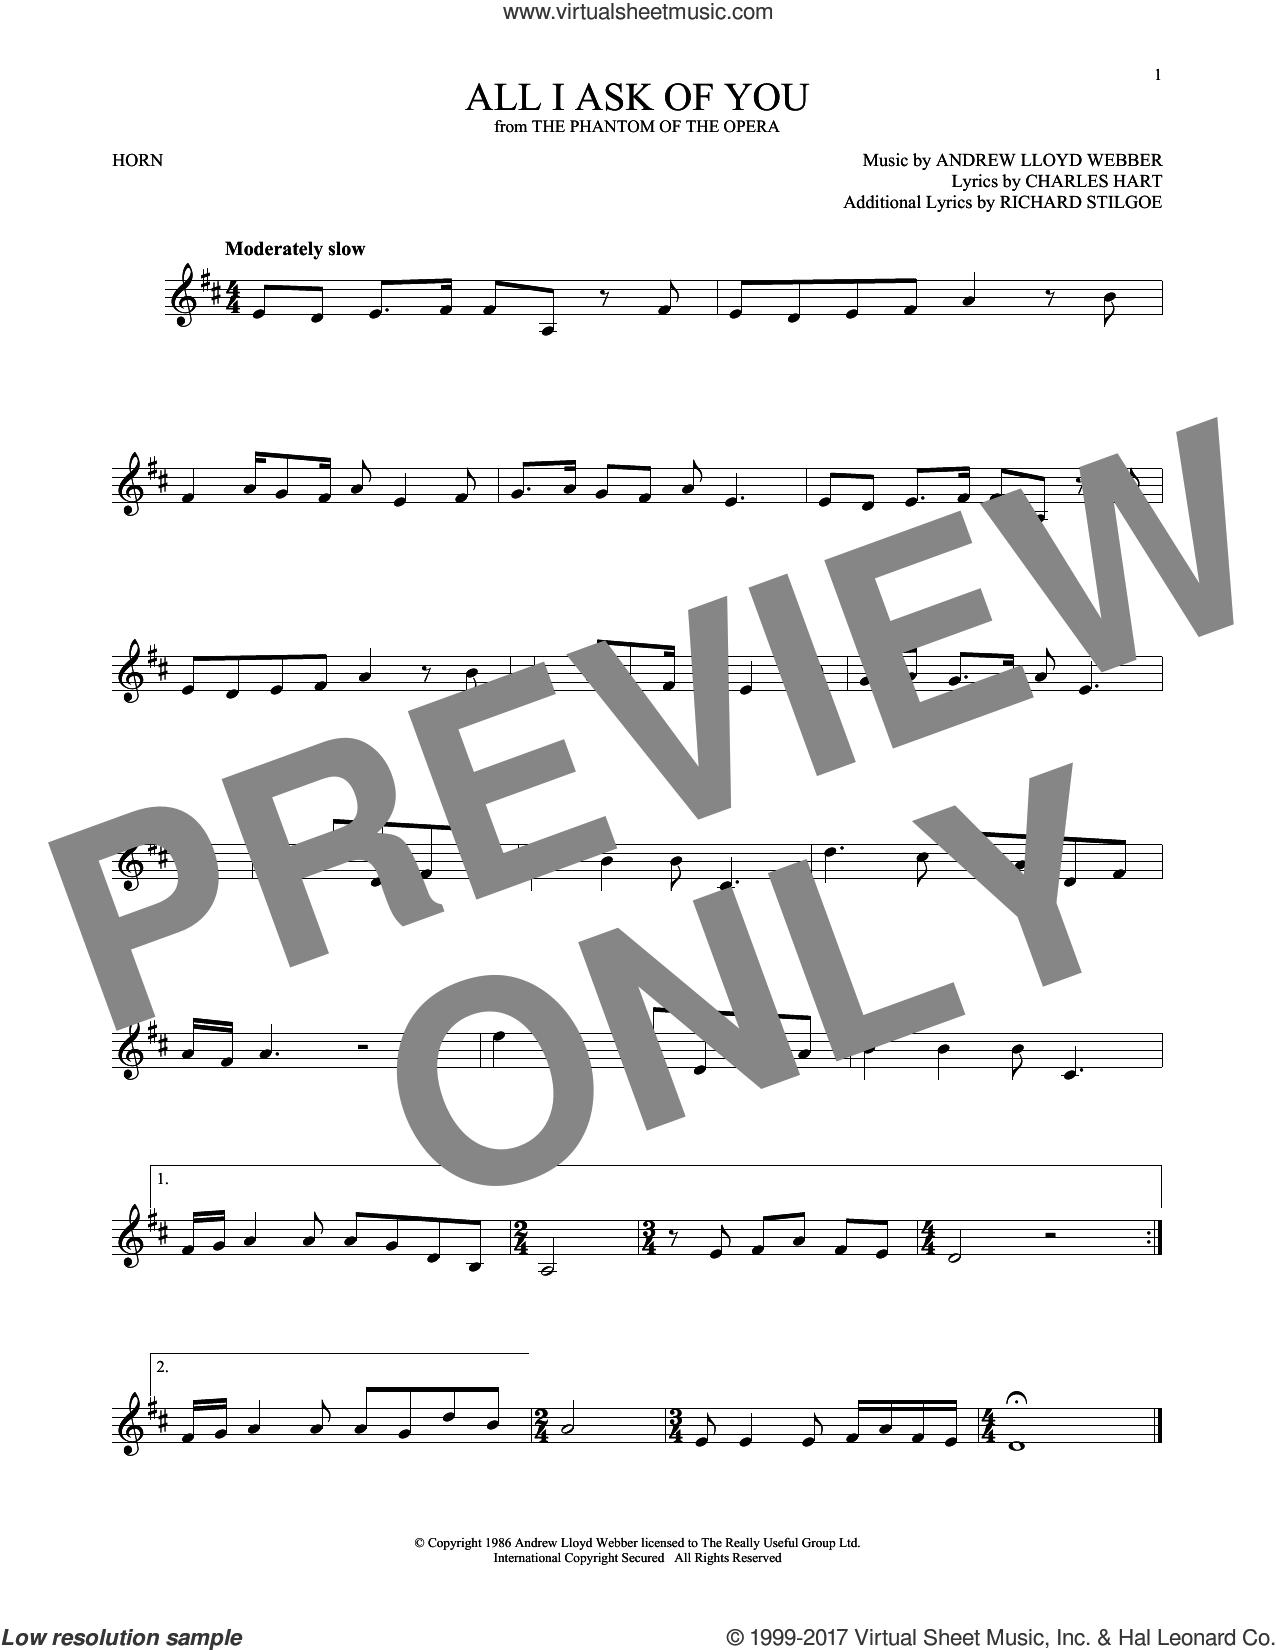 All I Ask Of You (from The Phantom Of The Opera) sheet music for horn solo by Andrew Lloyd Webber, Barbra Streisand, Charles Hart and Richard Stilgoe, intermediate skill level